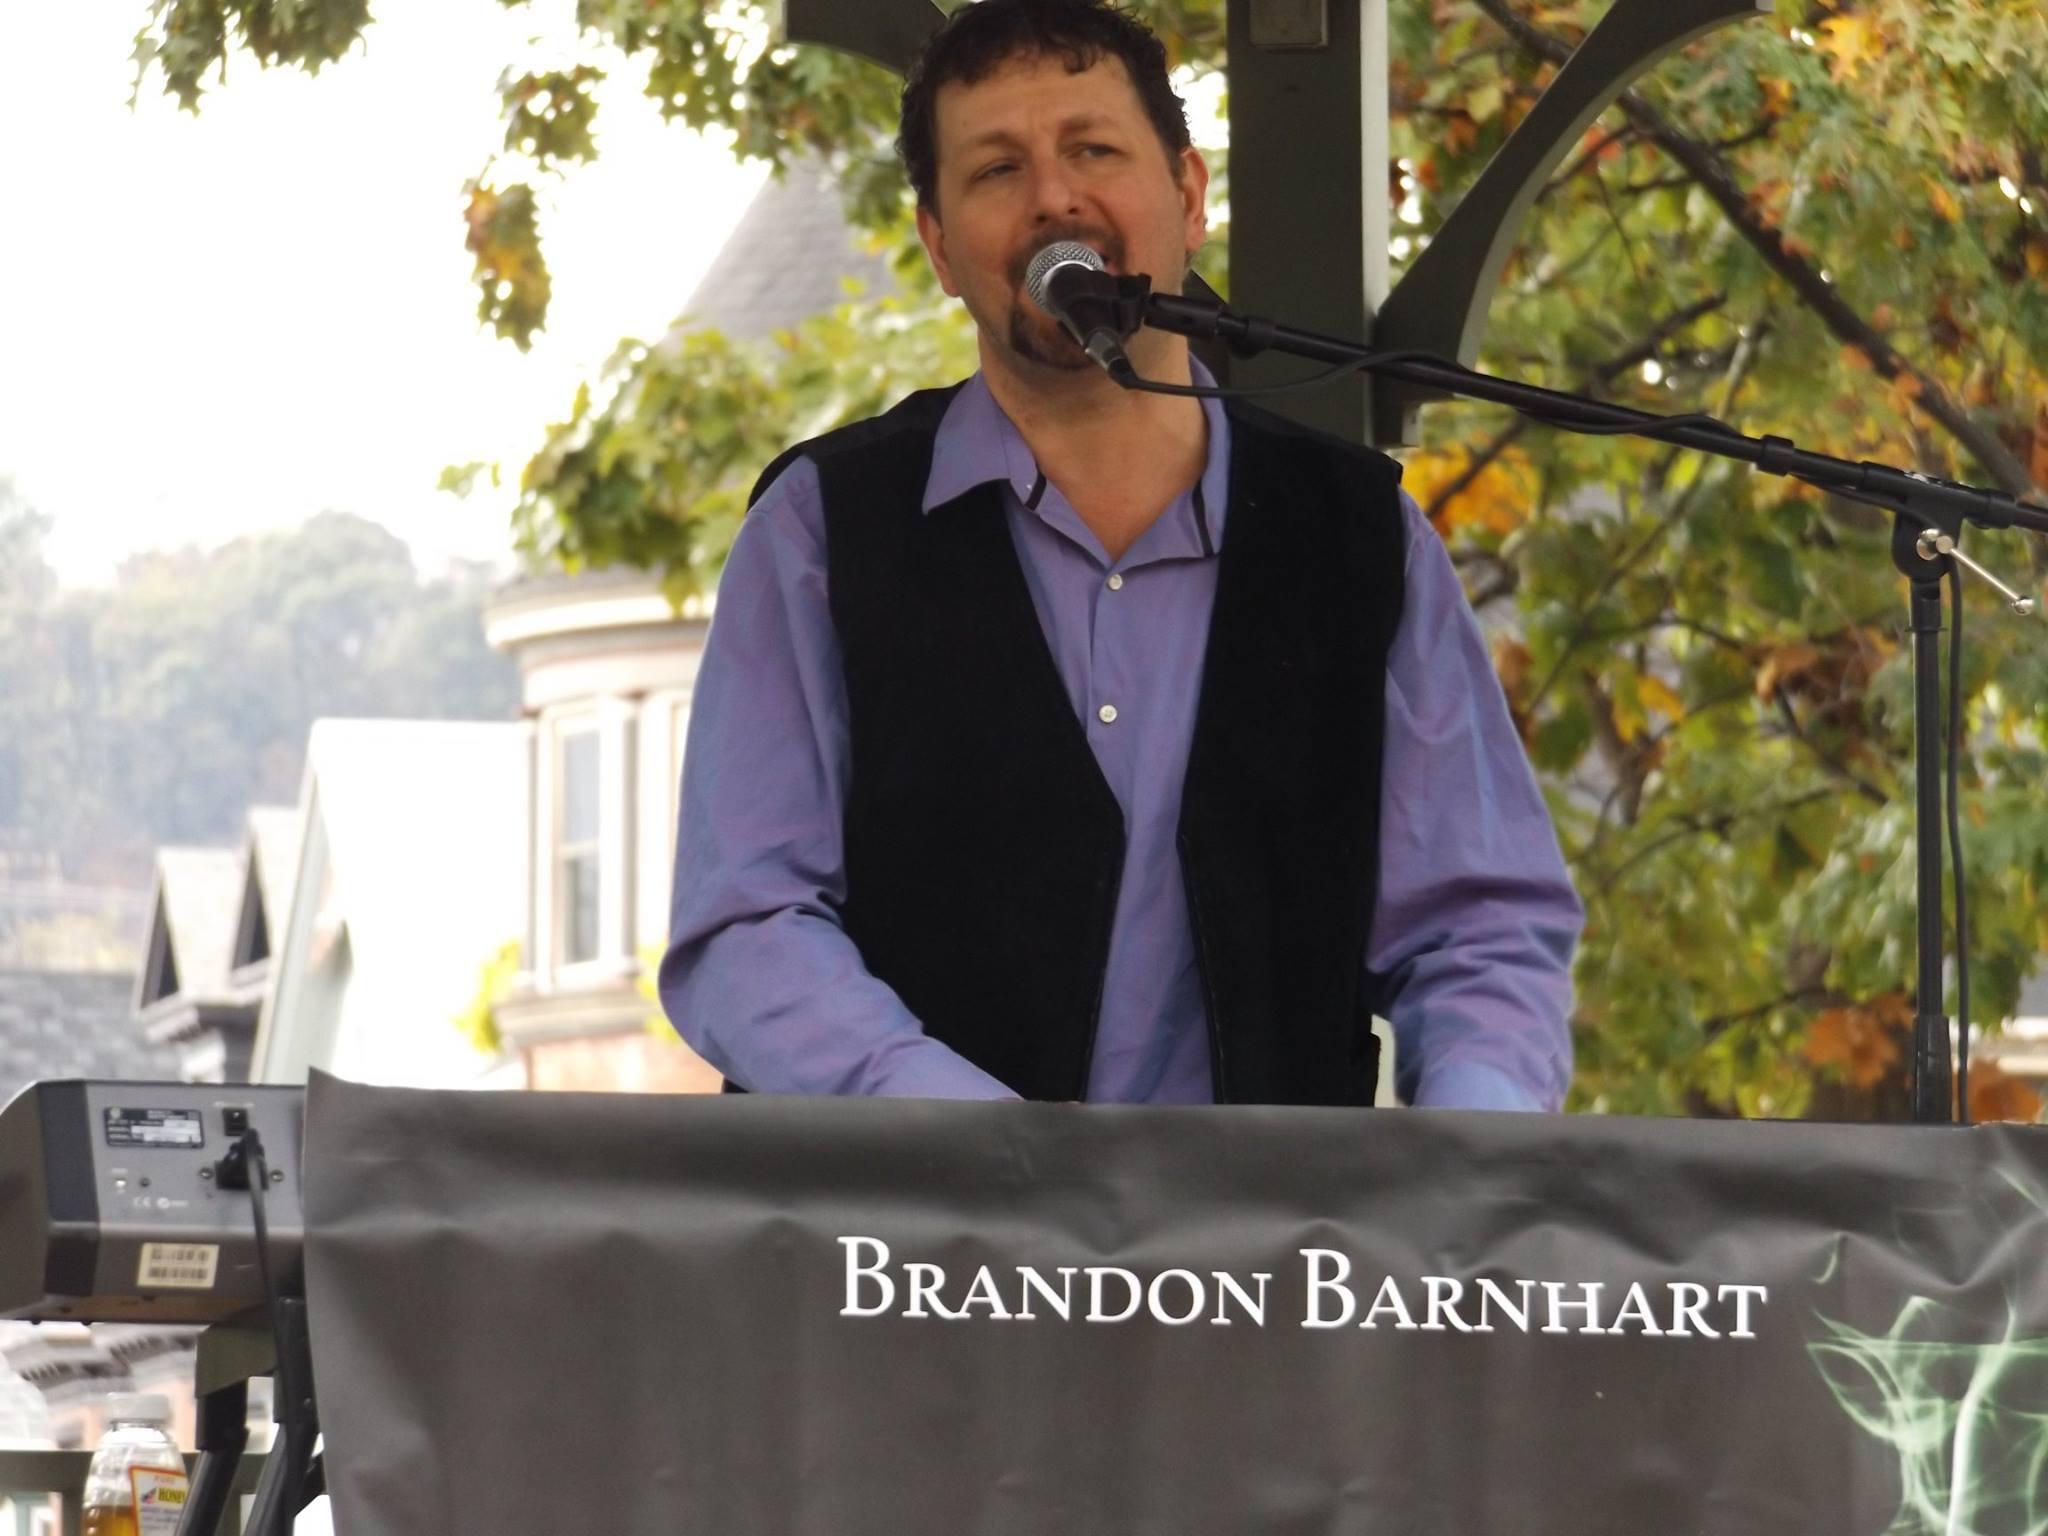 Live music with Brandon Barnhart